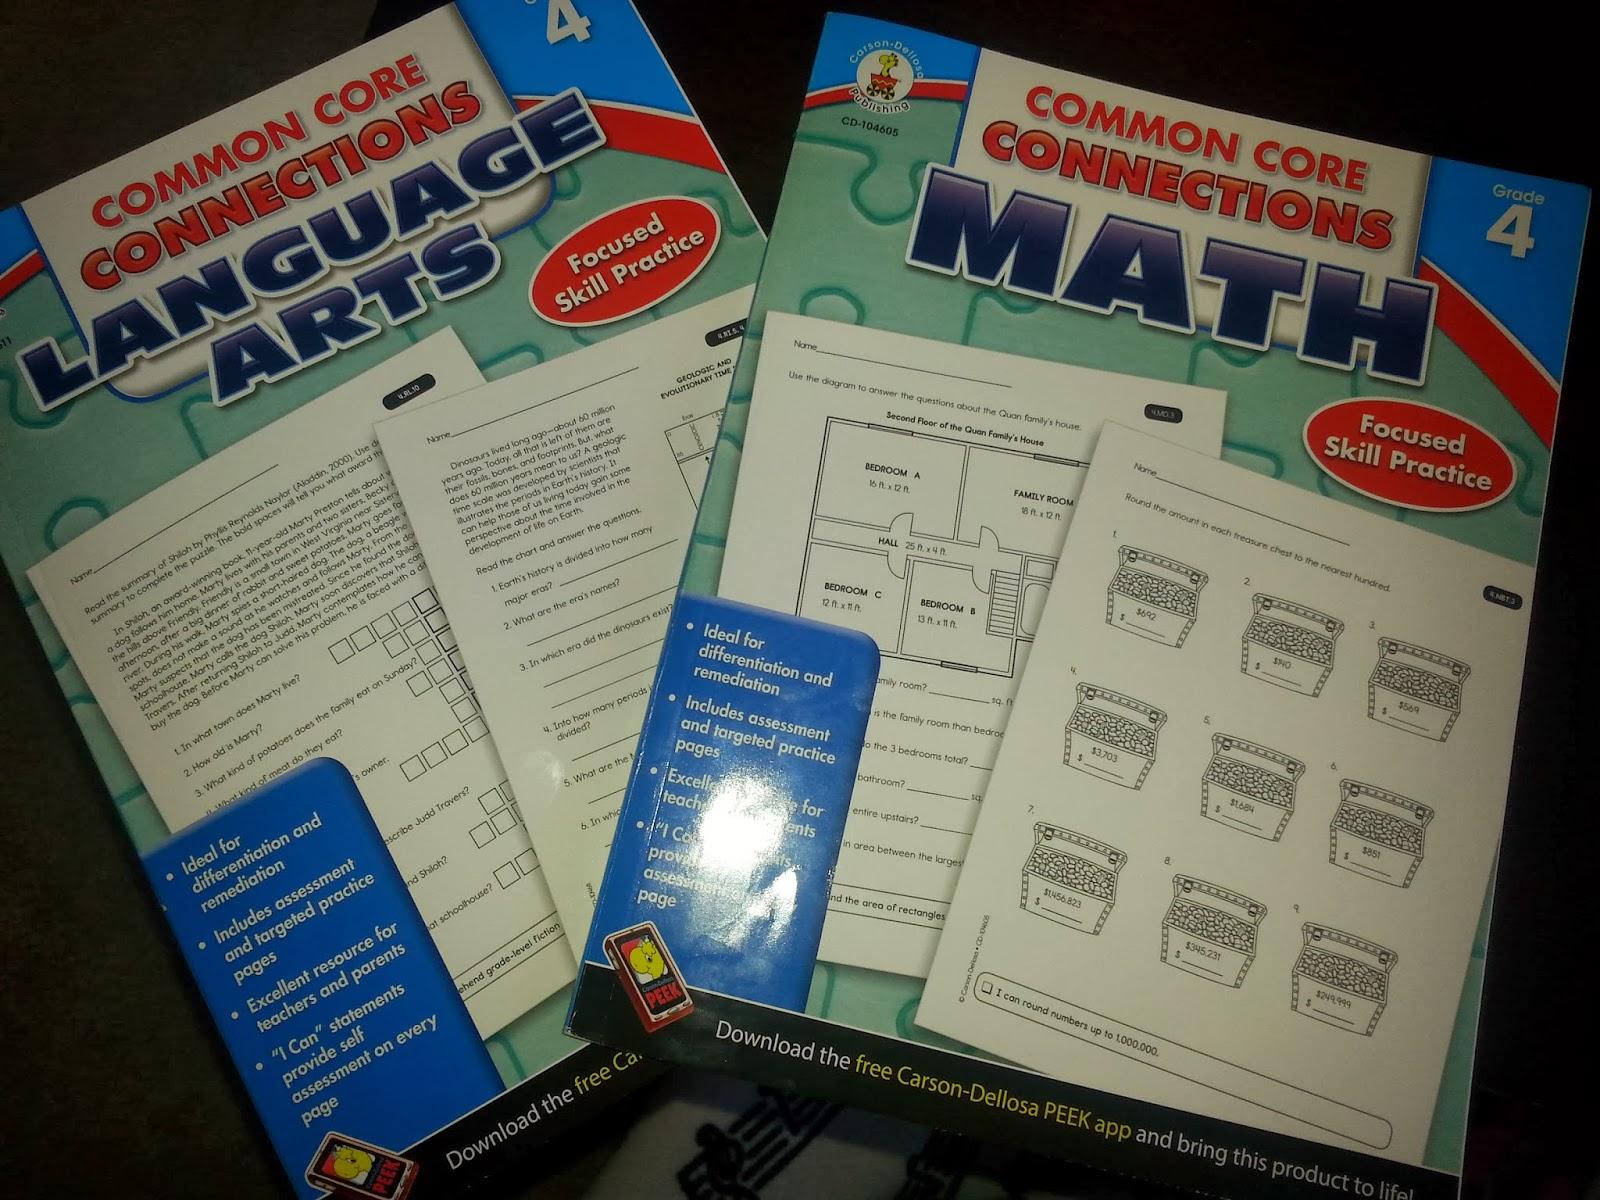 Carson dellosa free math worksheets